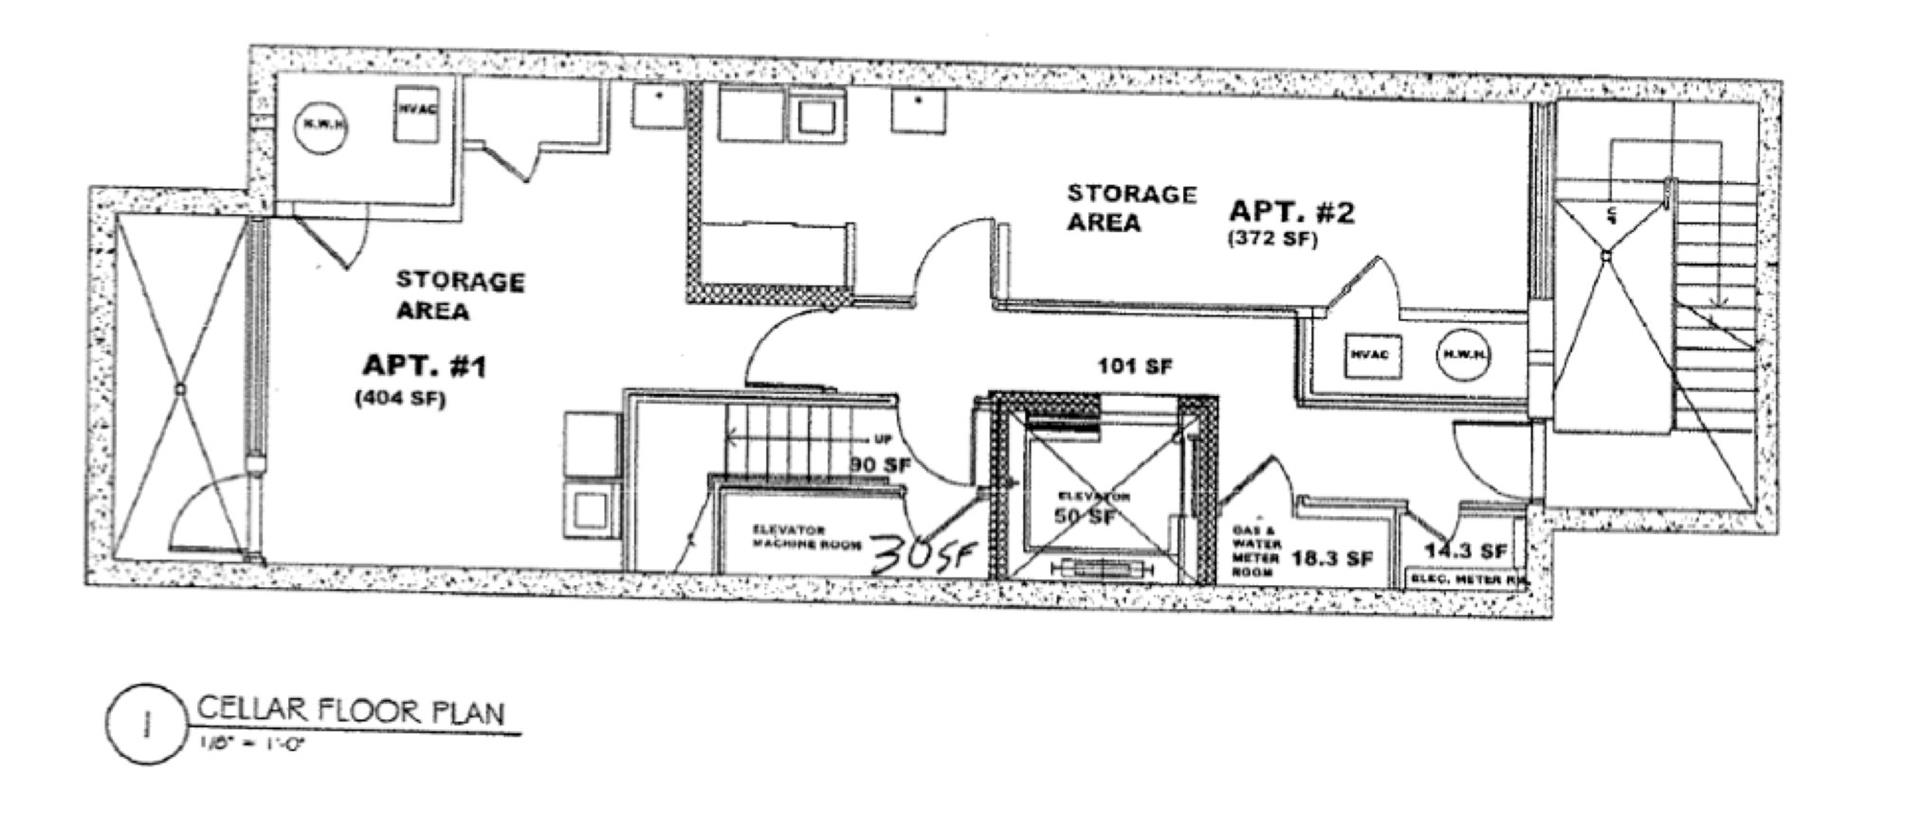 Floor plan of Das Haus, 90 Clermont Avenue - Fort Greene, New York